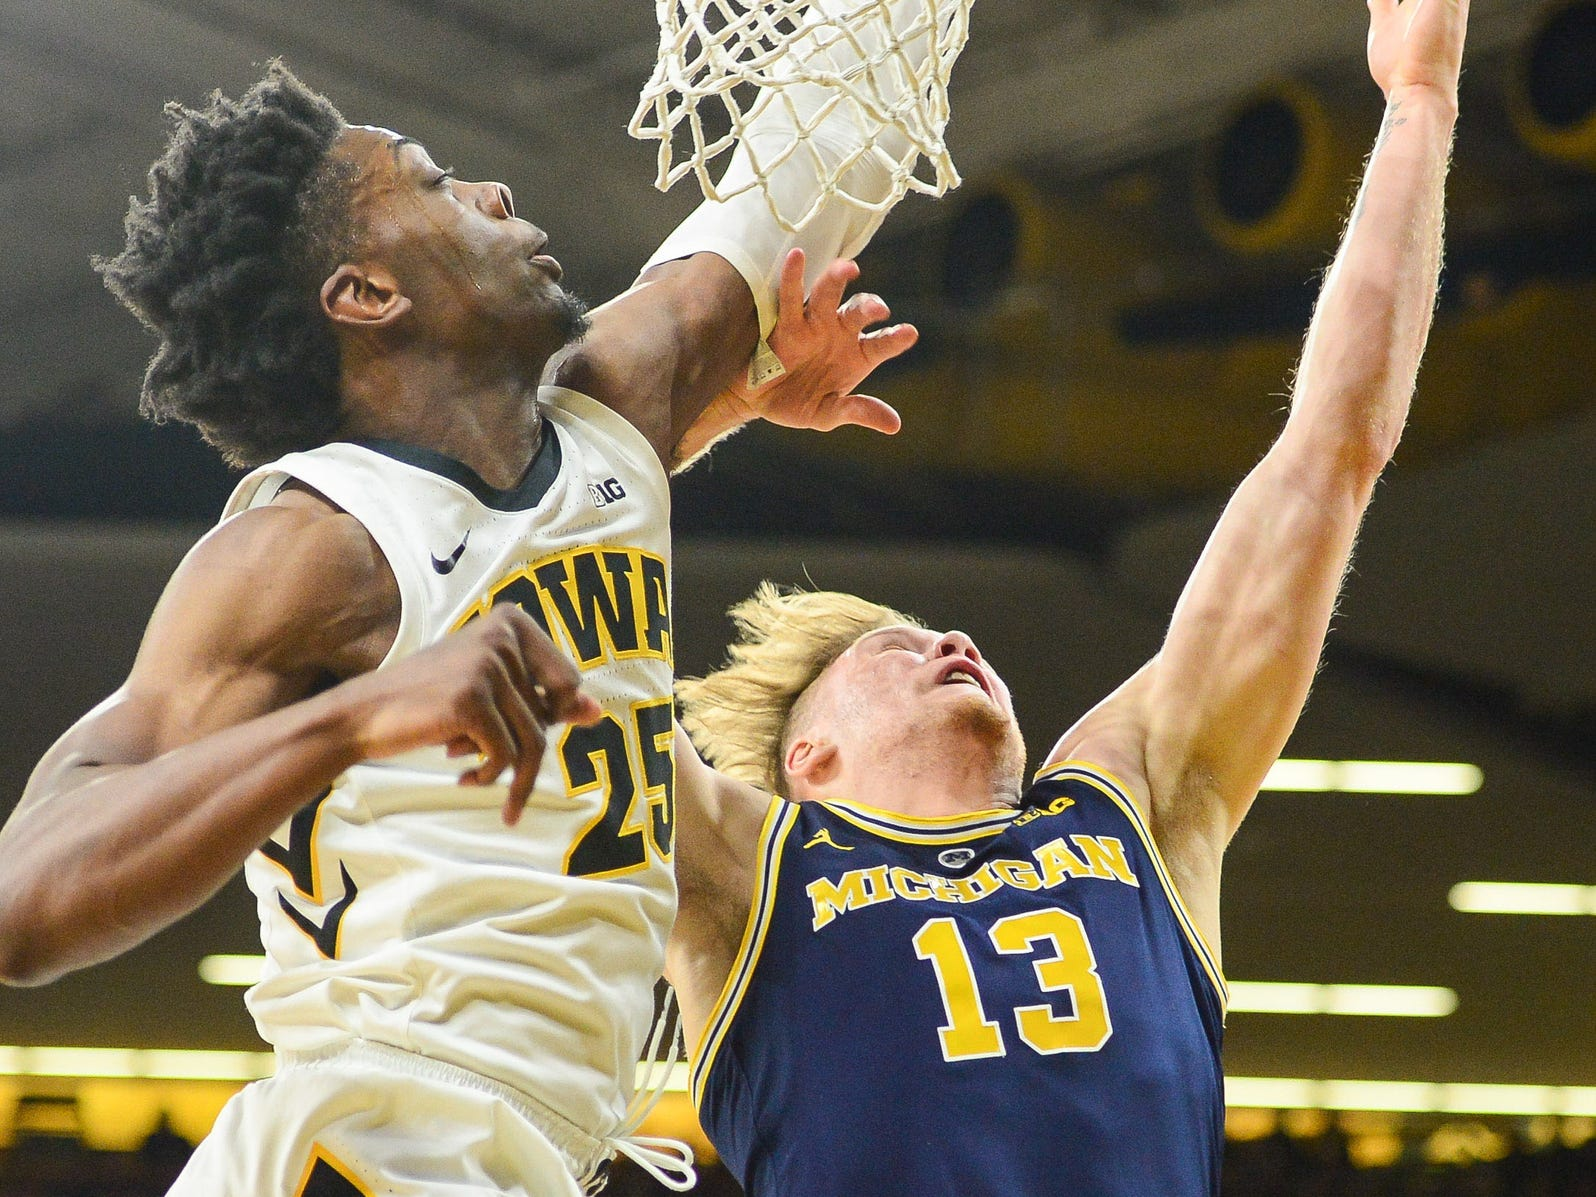 Michigan forward Ignas Brazdeikis shoots as Iowa forward Tyler Cook defends during the first half Feb. 1, 2019 in Iowa City, Iowa.